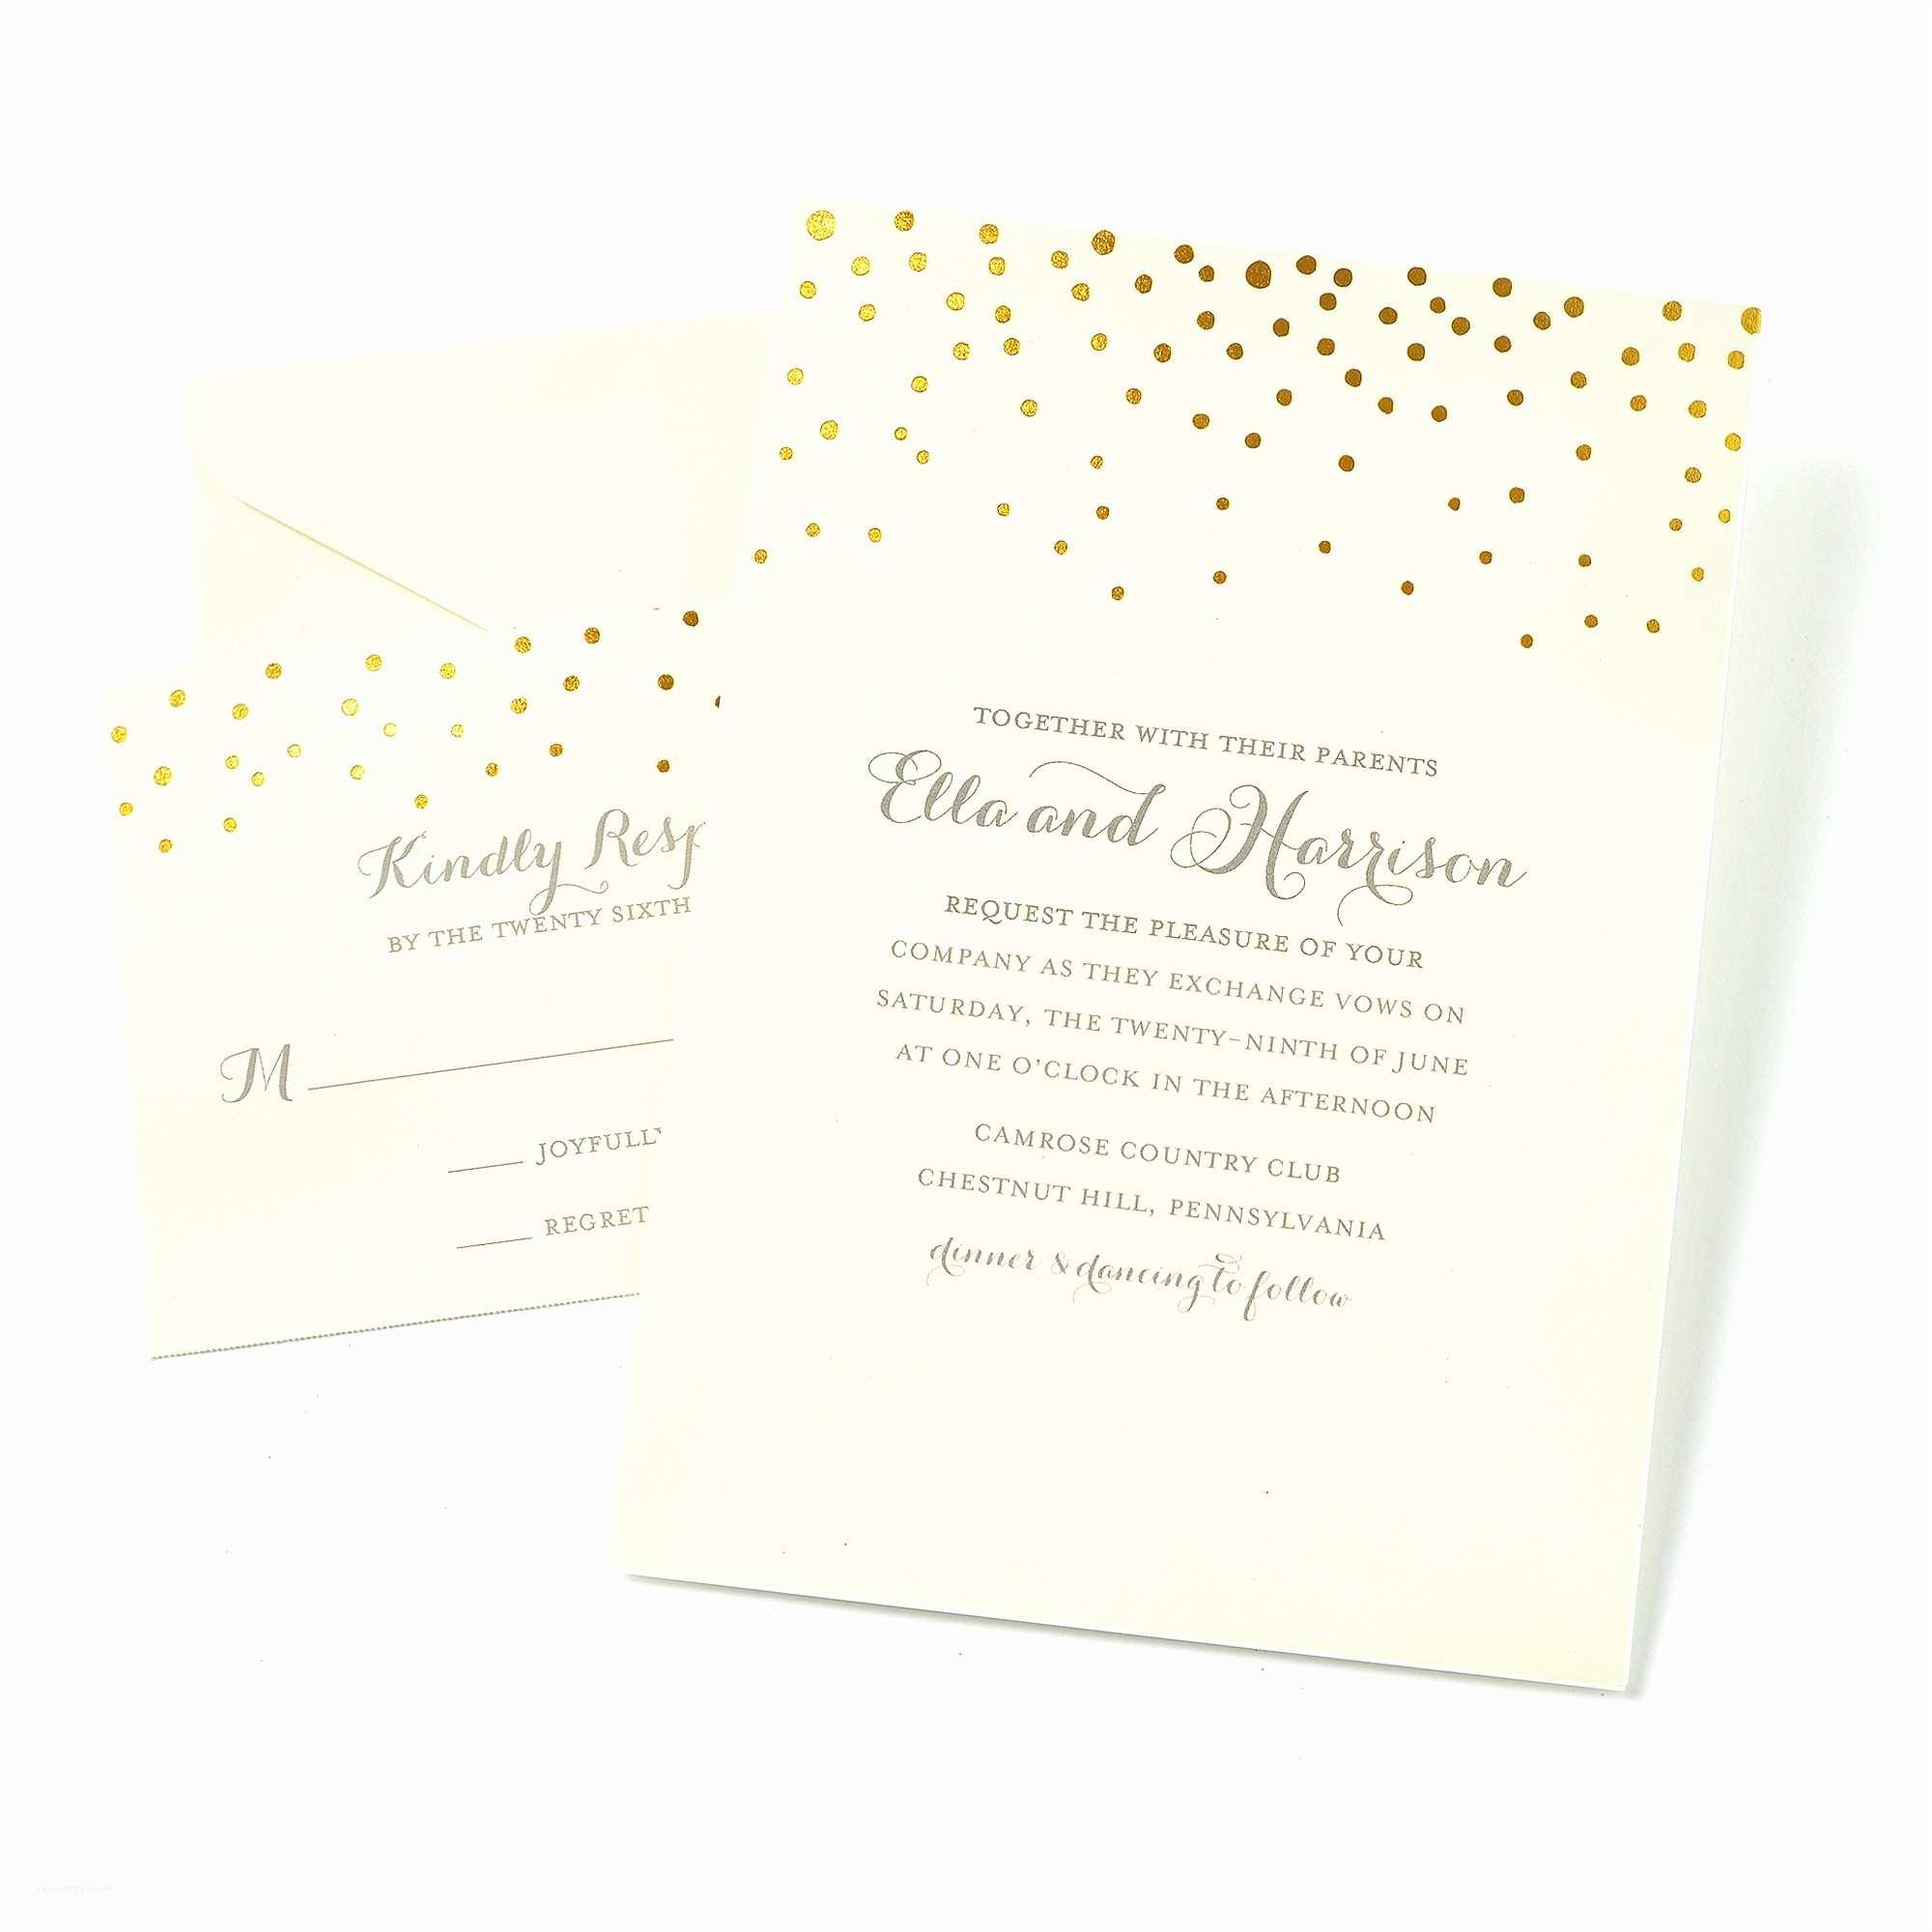 Walmart Wedding Invitations Make Your Own Wedding Invitations Walmart Modern Designs